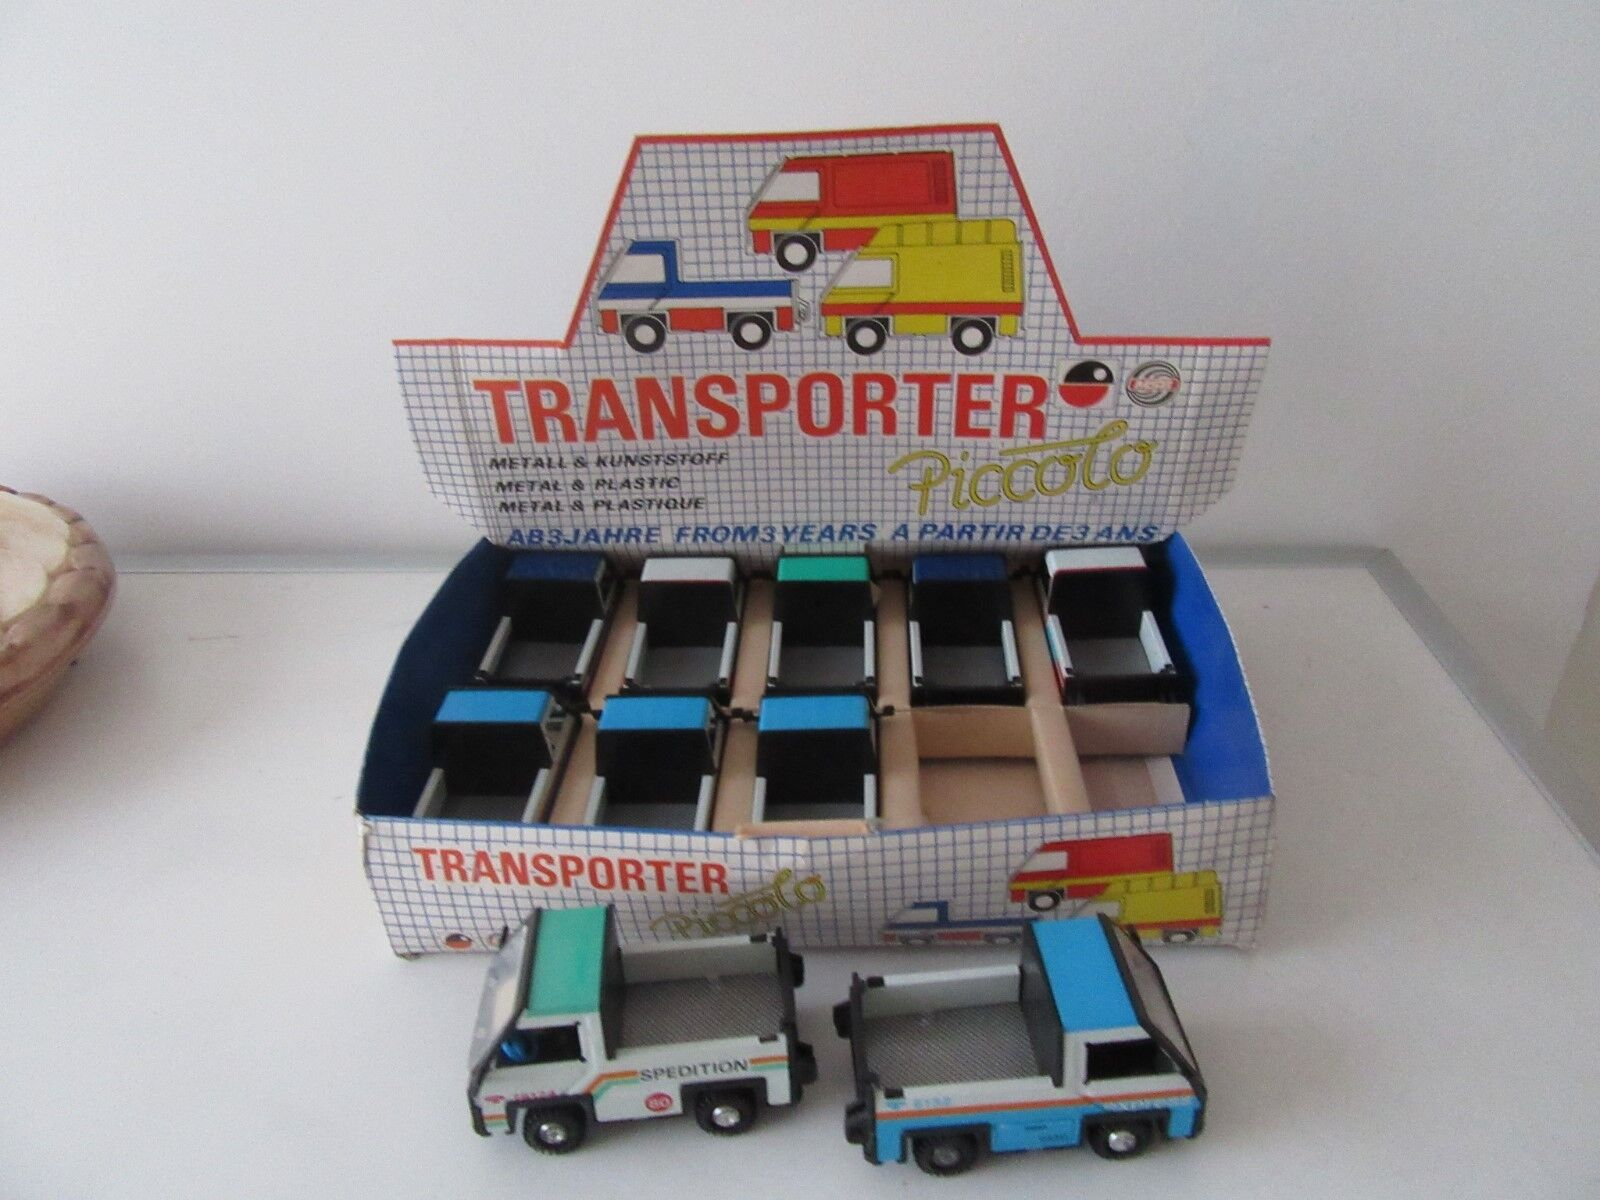 Ostalgie-speelgoed  veb transporter piccolo.   Offriamo vari marchi famosi